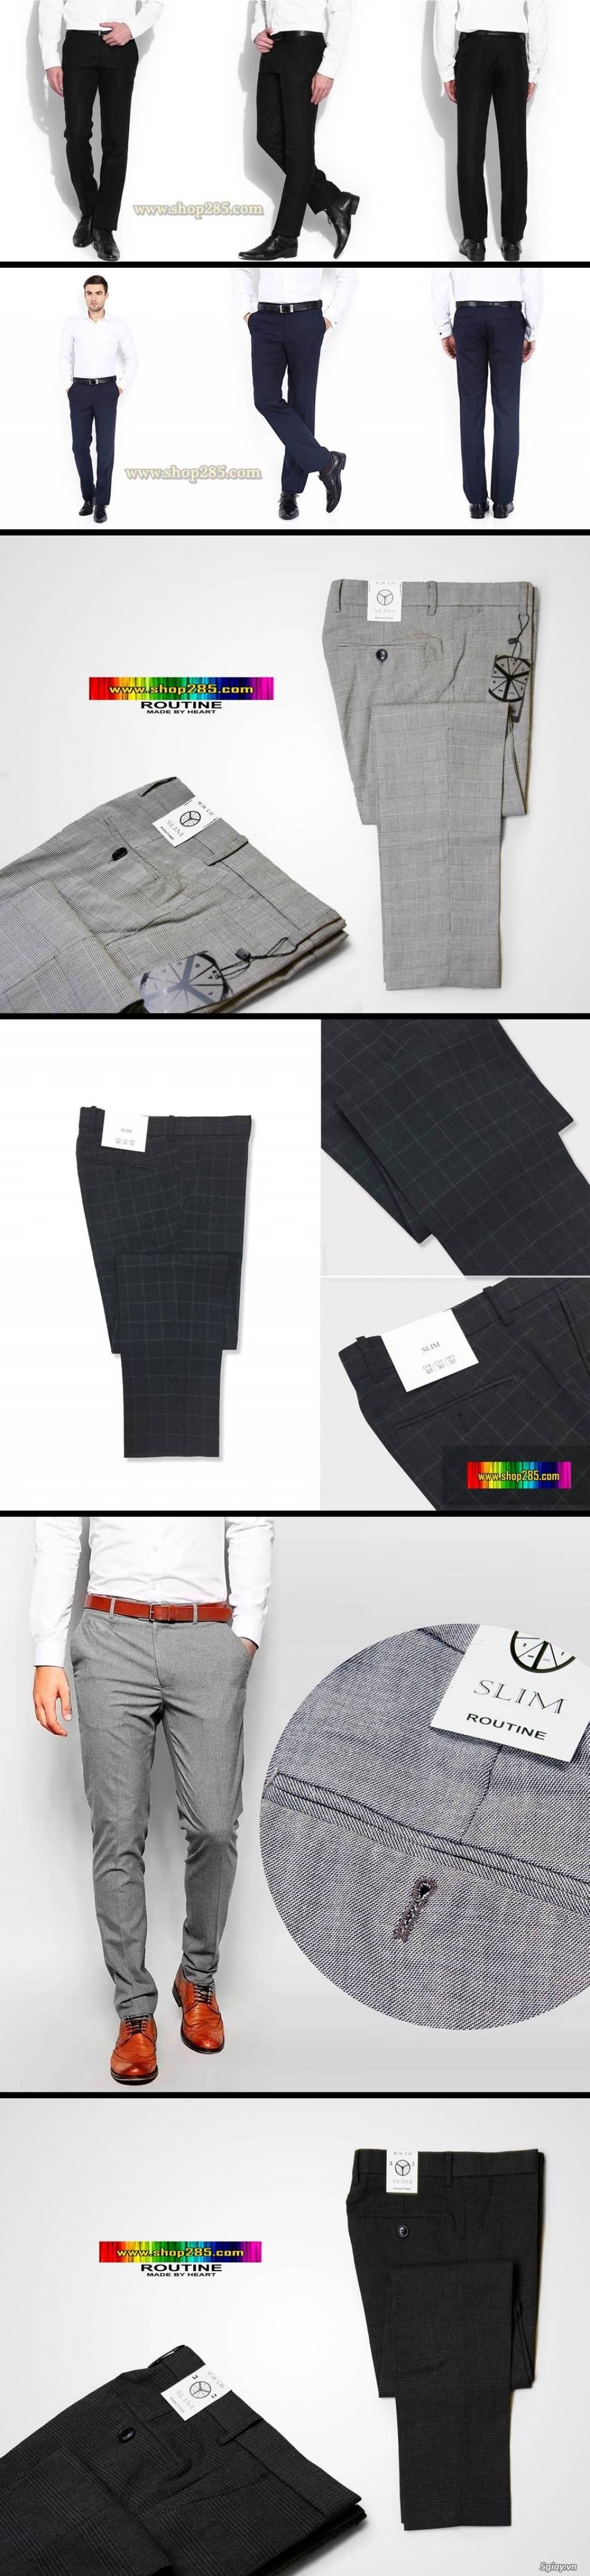 Shop285.com - Shop quần áo : Zara,Jules,Jake*s,,Hollister,Aber,CK,Tommy,Levis - 37